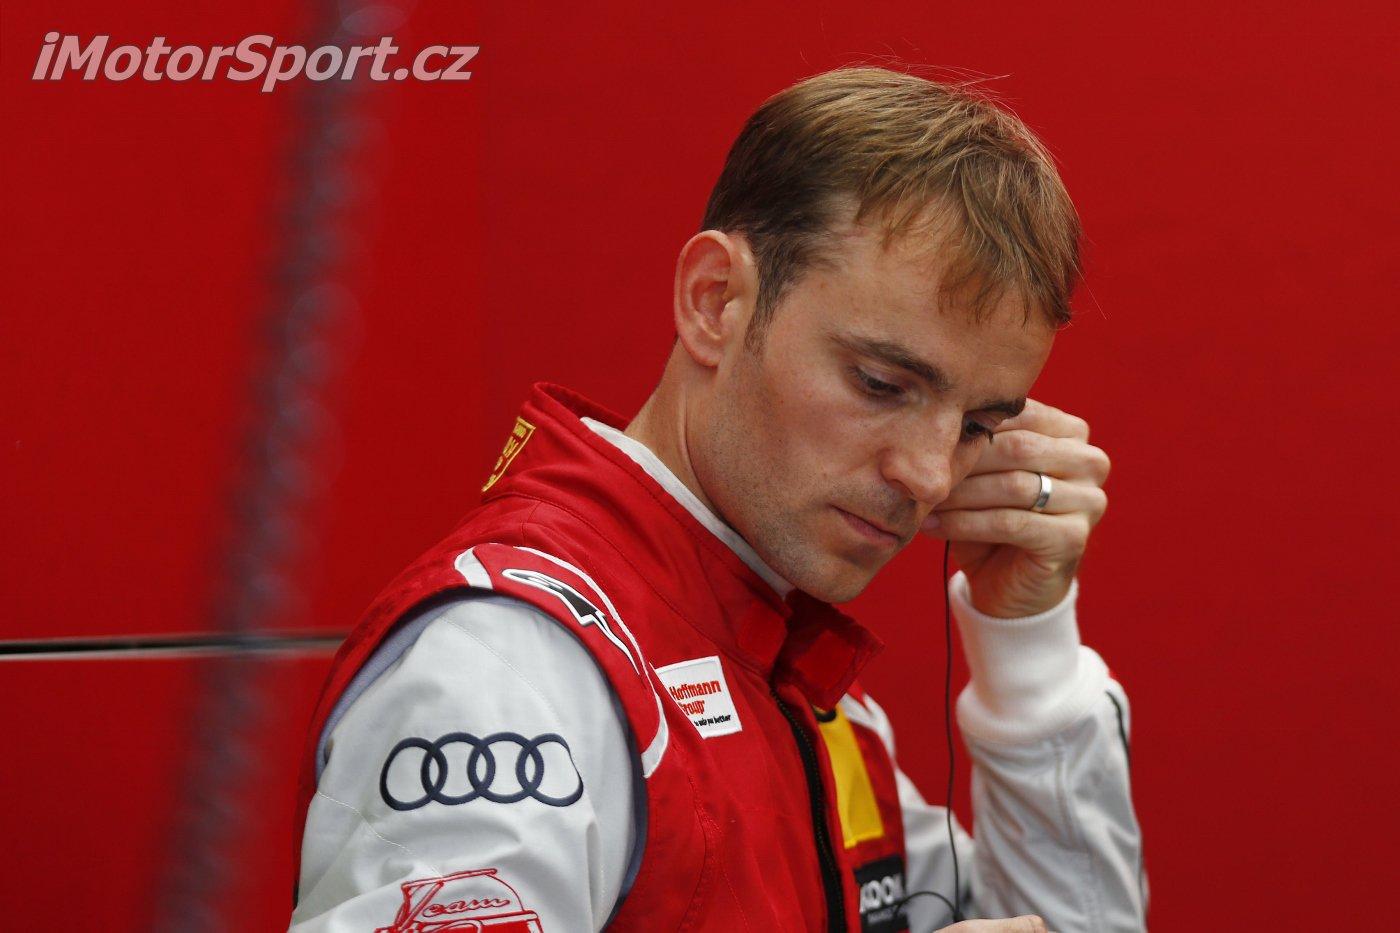 Jamie Green lituje rozhodnutí Mercedesu opustit DTM